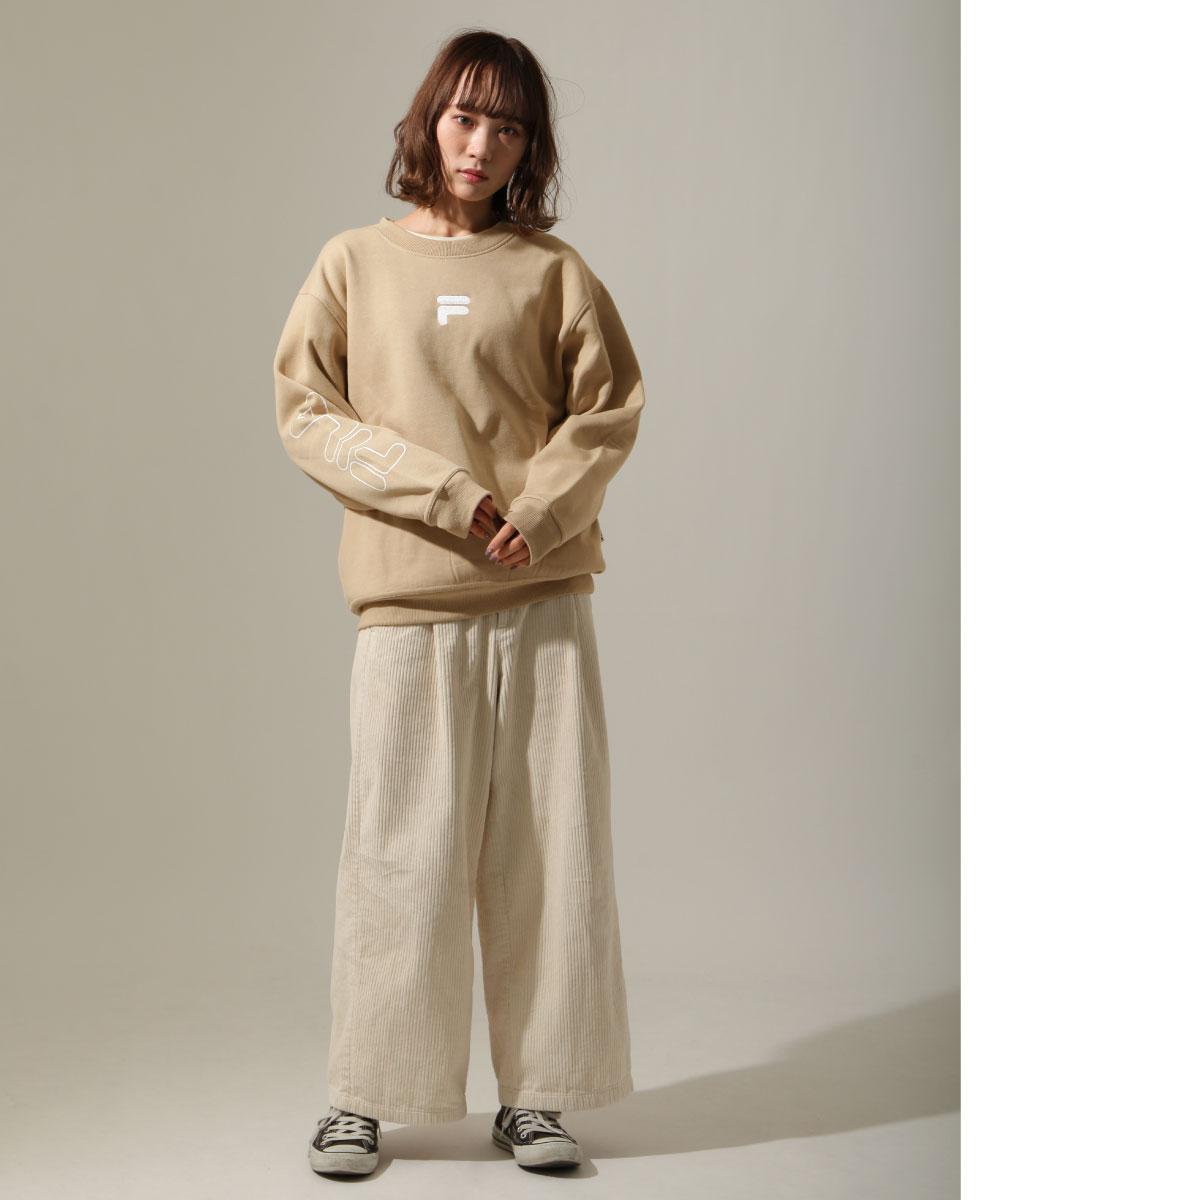 【FILA】袖子LOGO印刷內刷毛運動衫 6